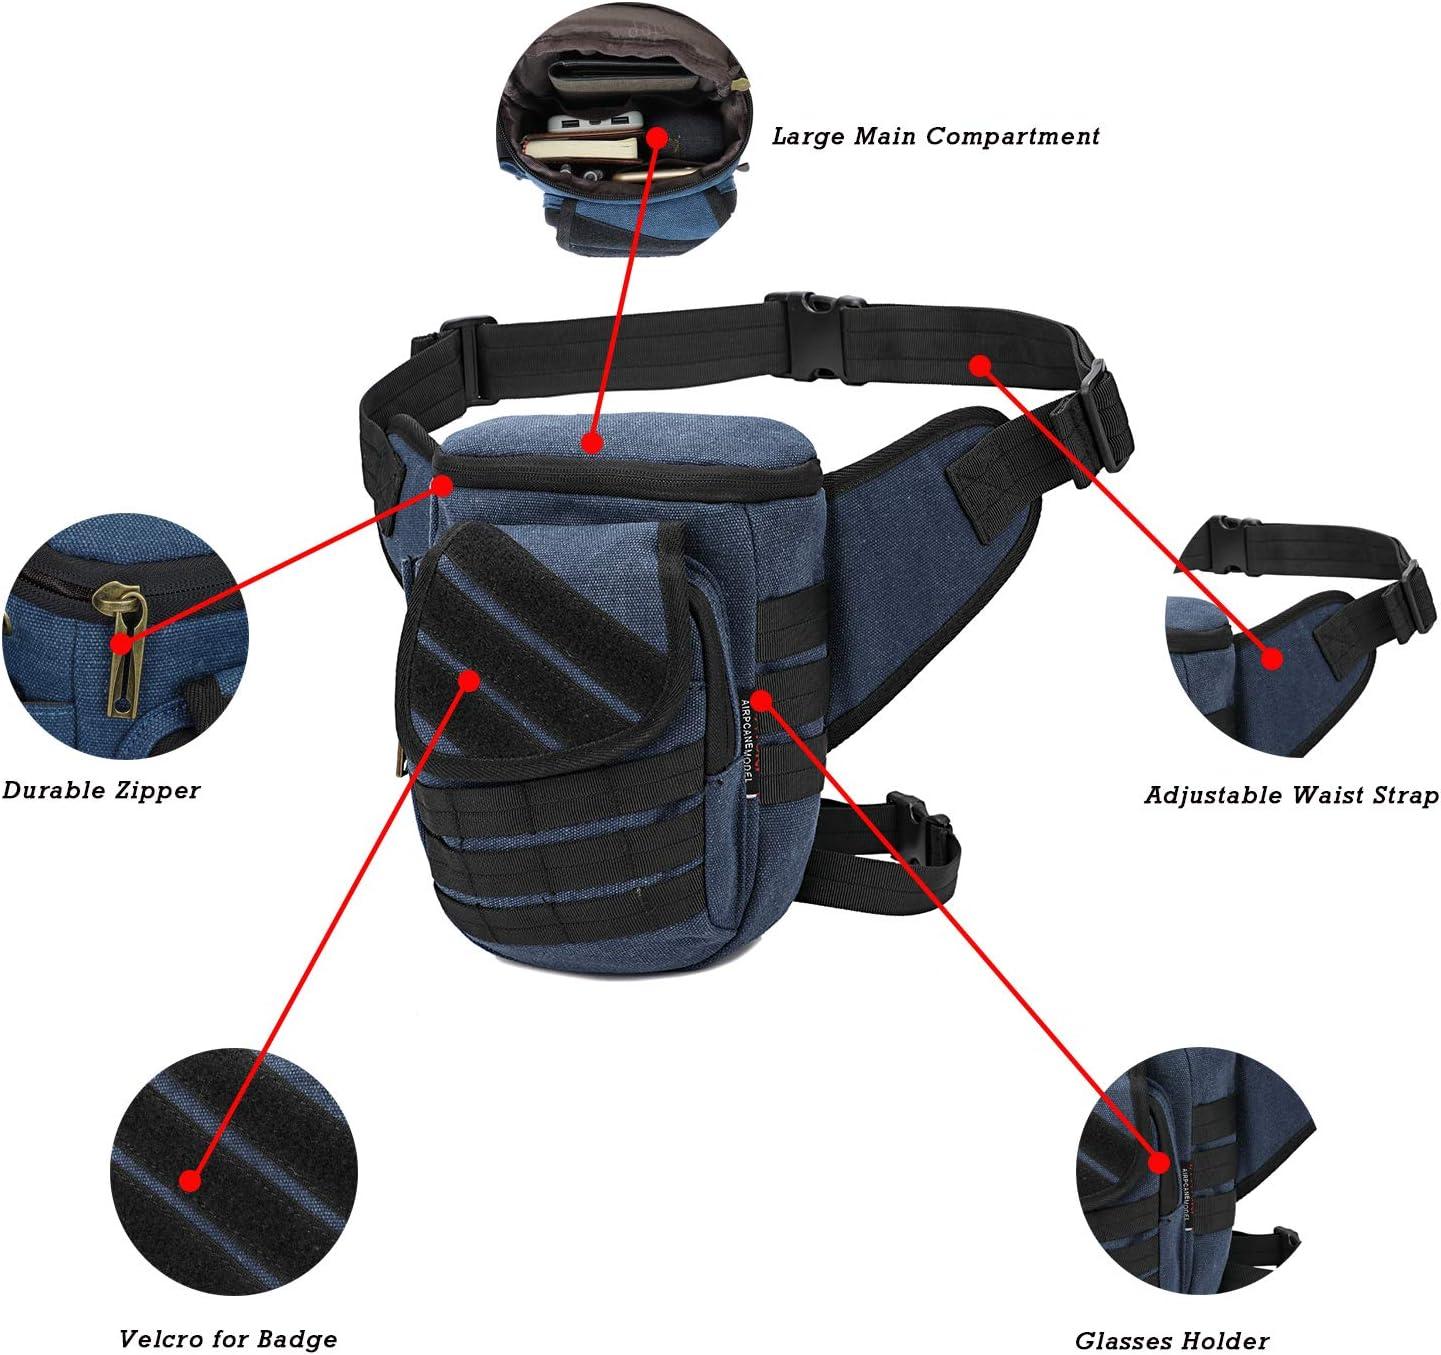 AOPUOP Canvas Tactical Pouch Leg Bag Multi-Functional Outdoor Leisure Waist Bag for Men and Women